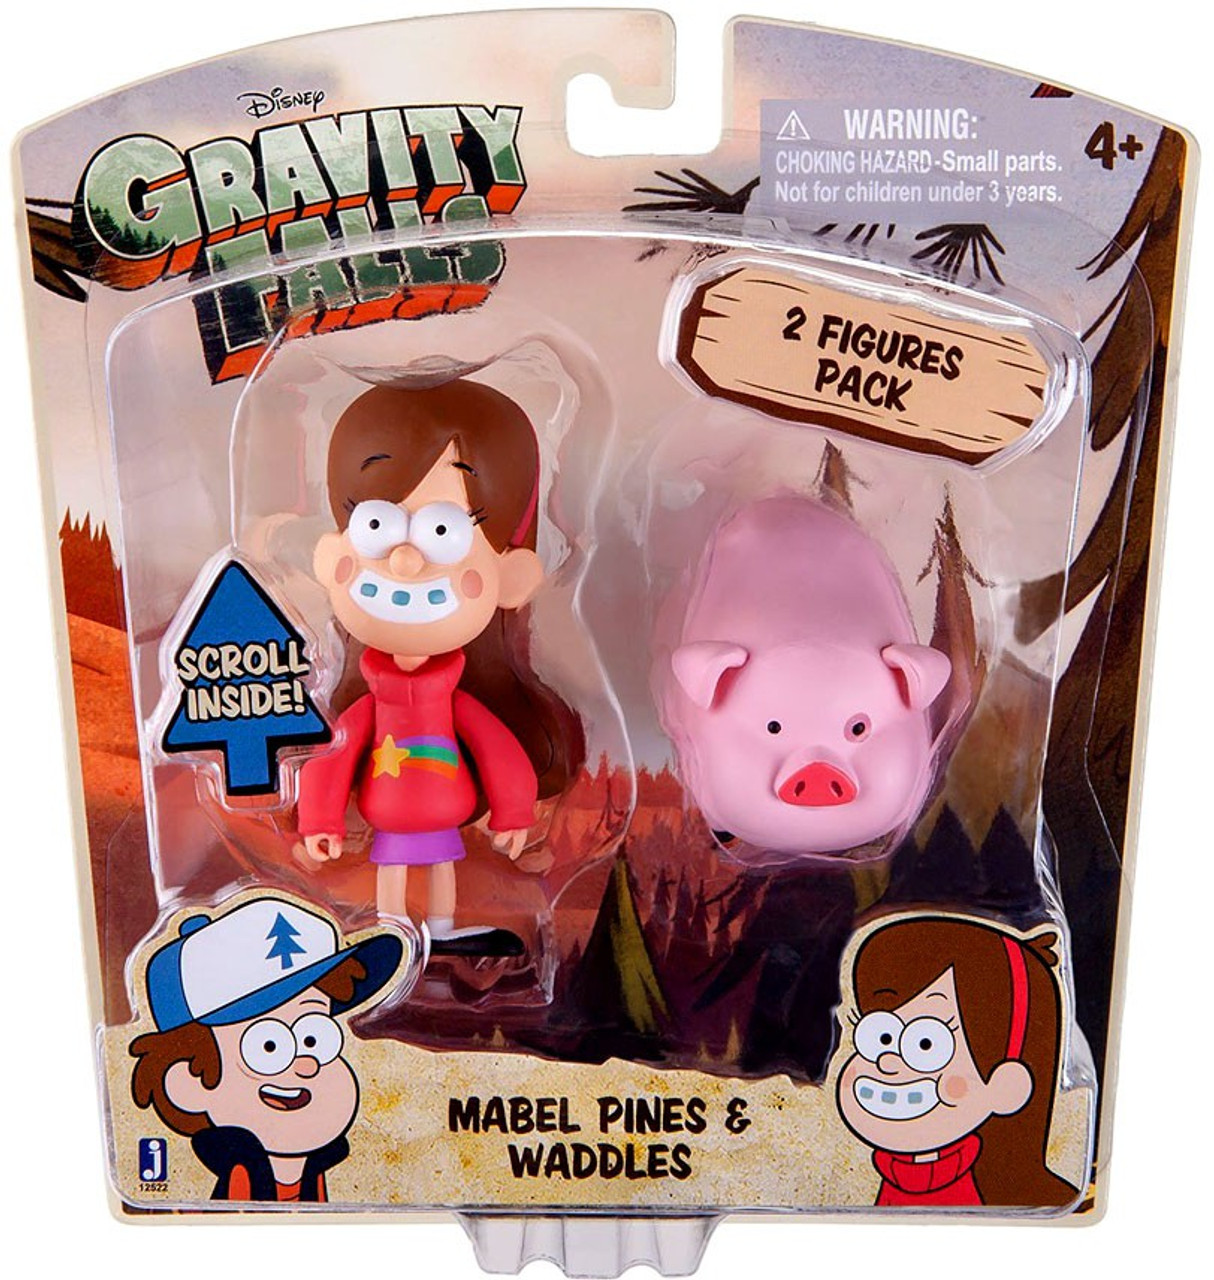 Disney Gravity Falls Mabel Pines & Waddles Action Figure 2-Pack